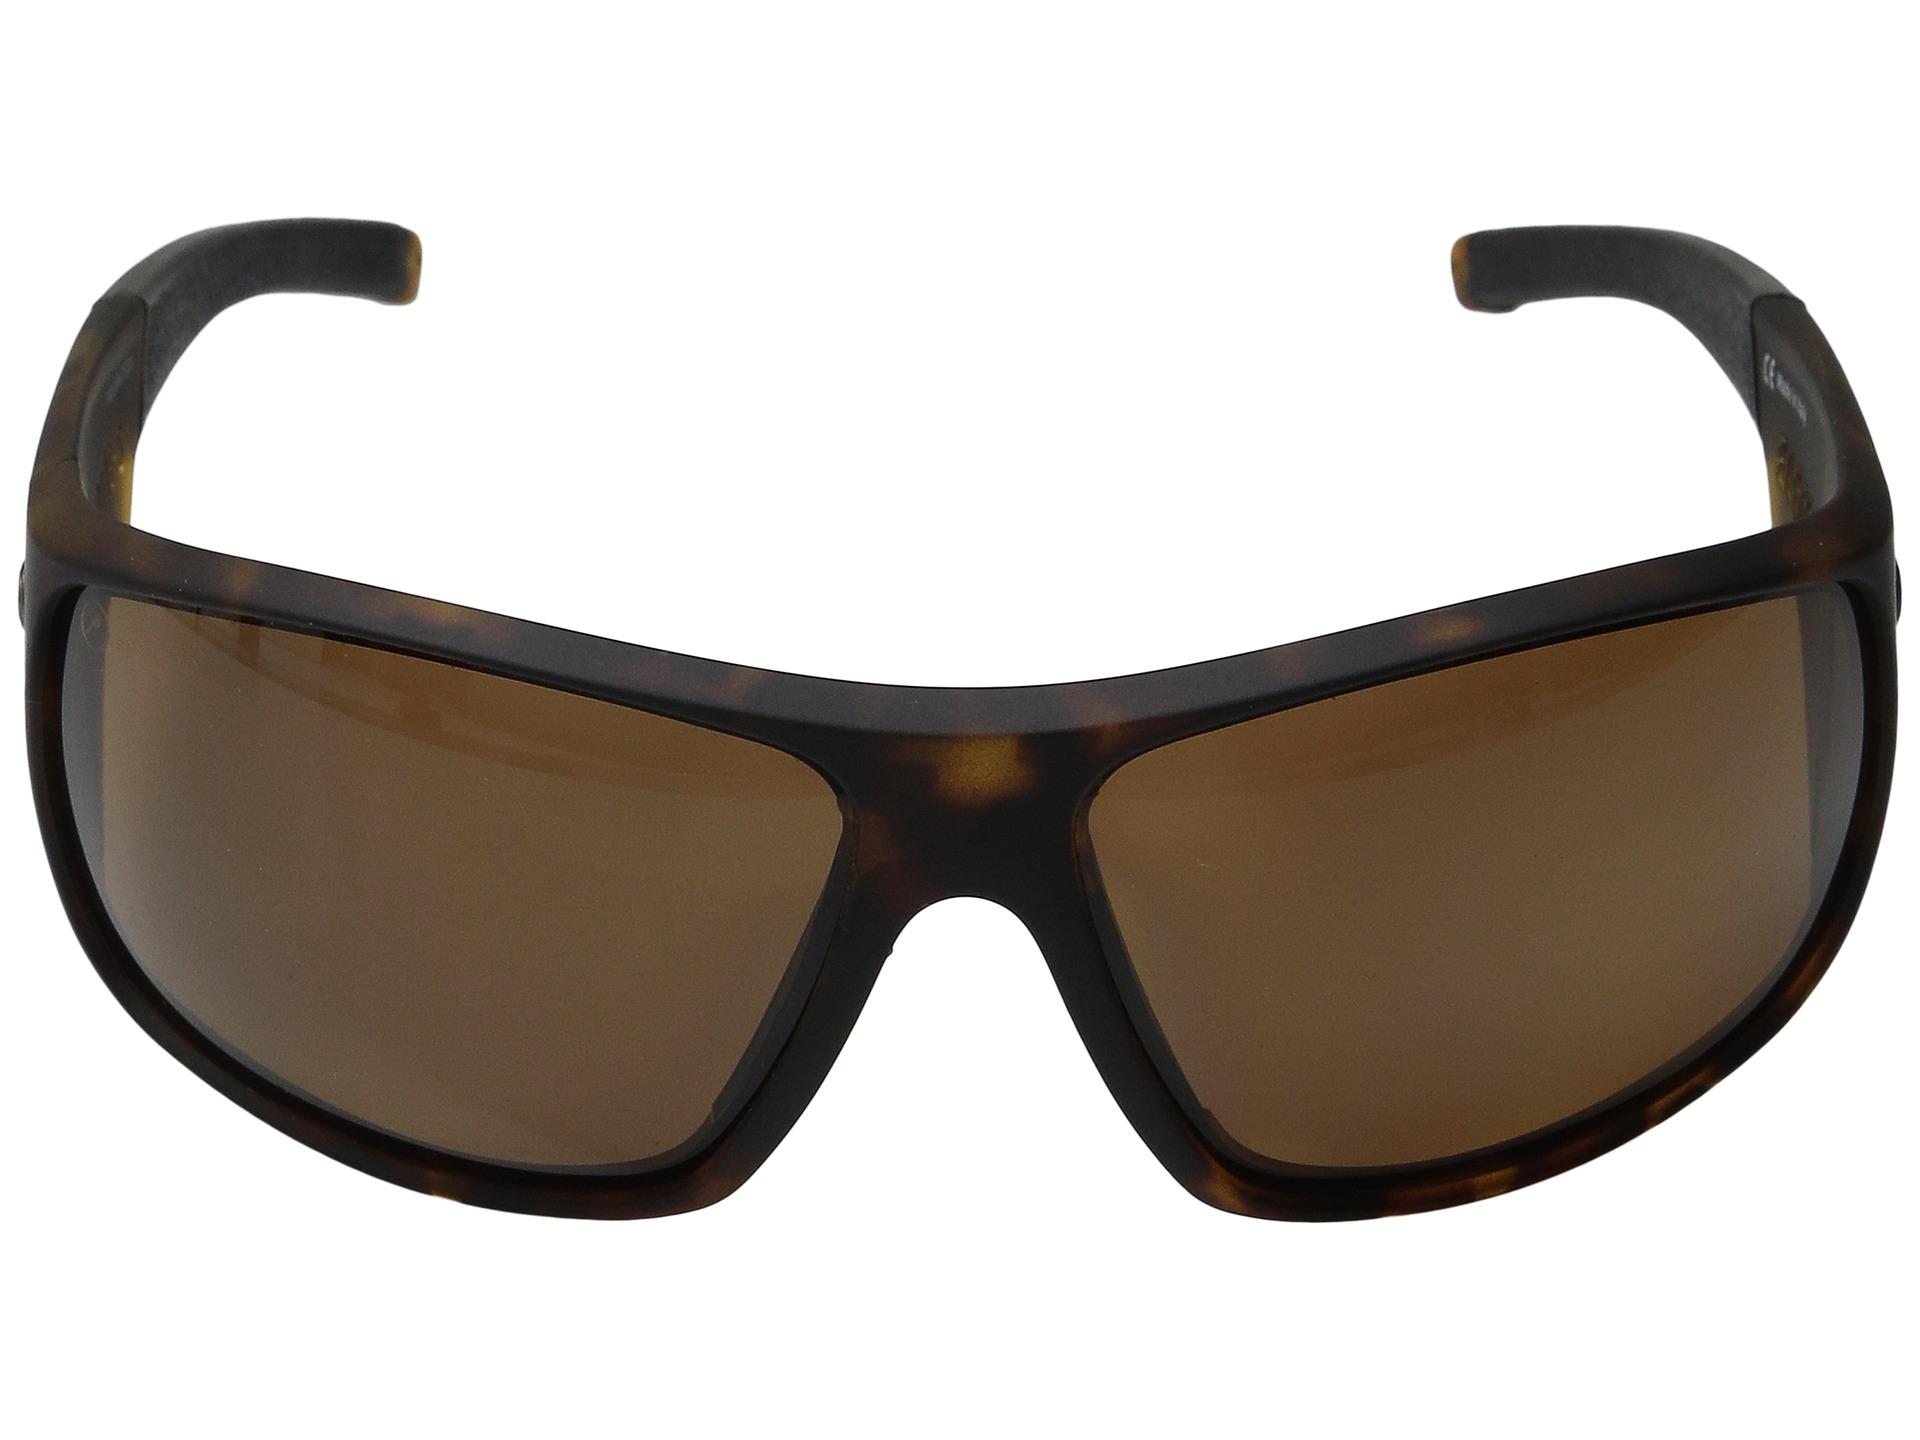 425c1f38de Electric Eyewear Backbone S Matte Tort Melanin Level 1 Bronze Polarized -  Zappos.com Free Shipping BOTH Ways